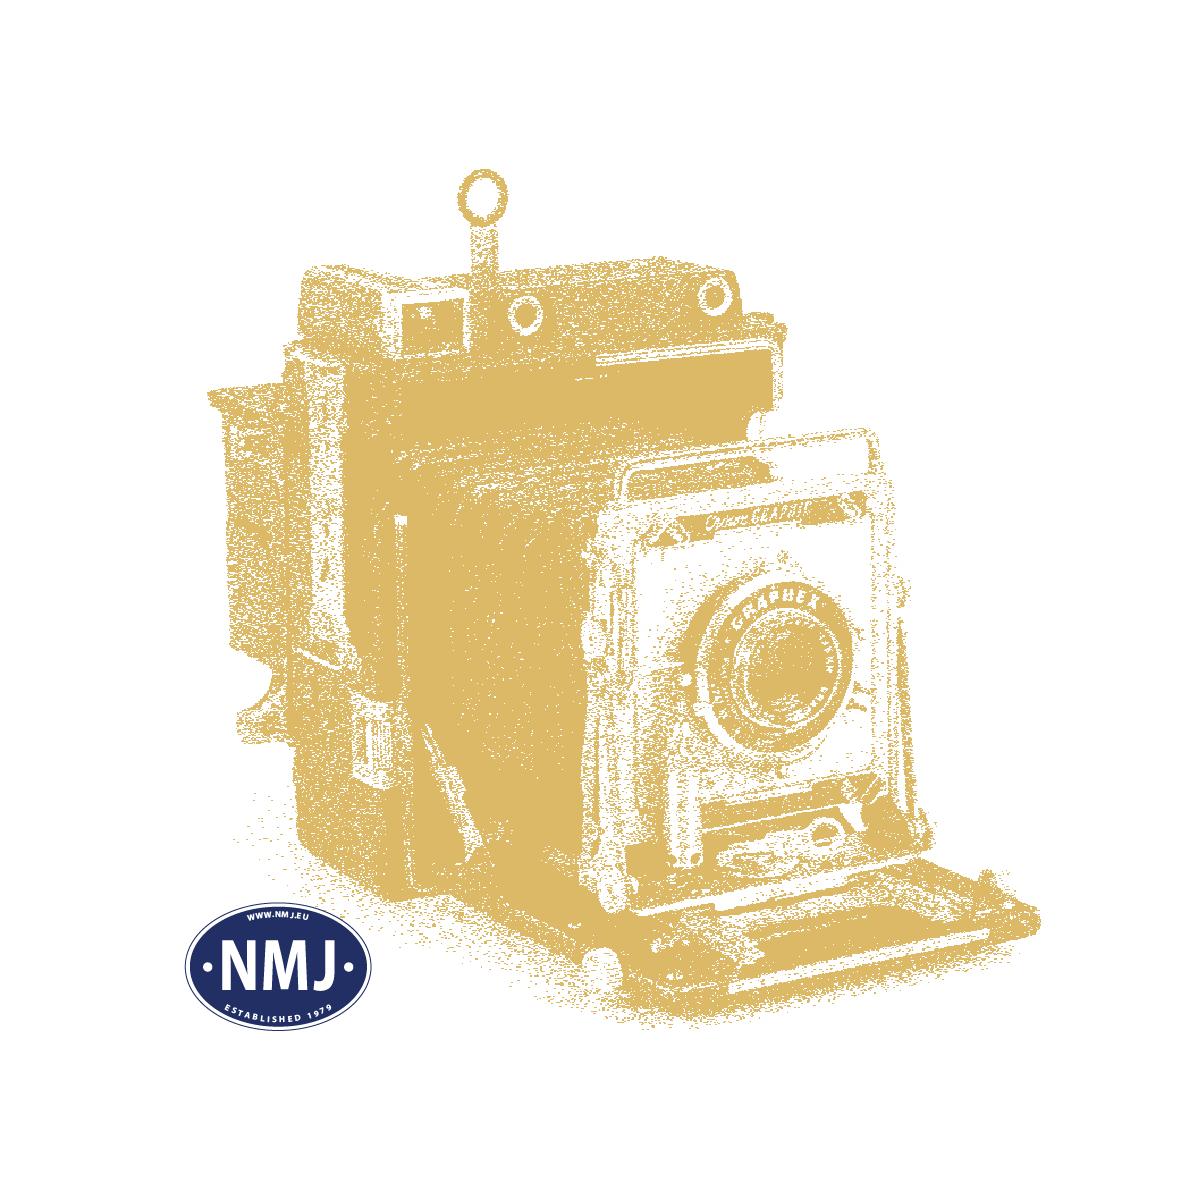 MWB-PW405 - Gresstuster m/ Ugress, 4,5 mm, Gyllen Sommer, 21 x 15 Cm